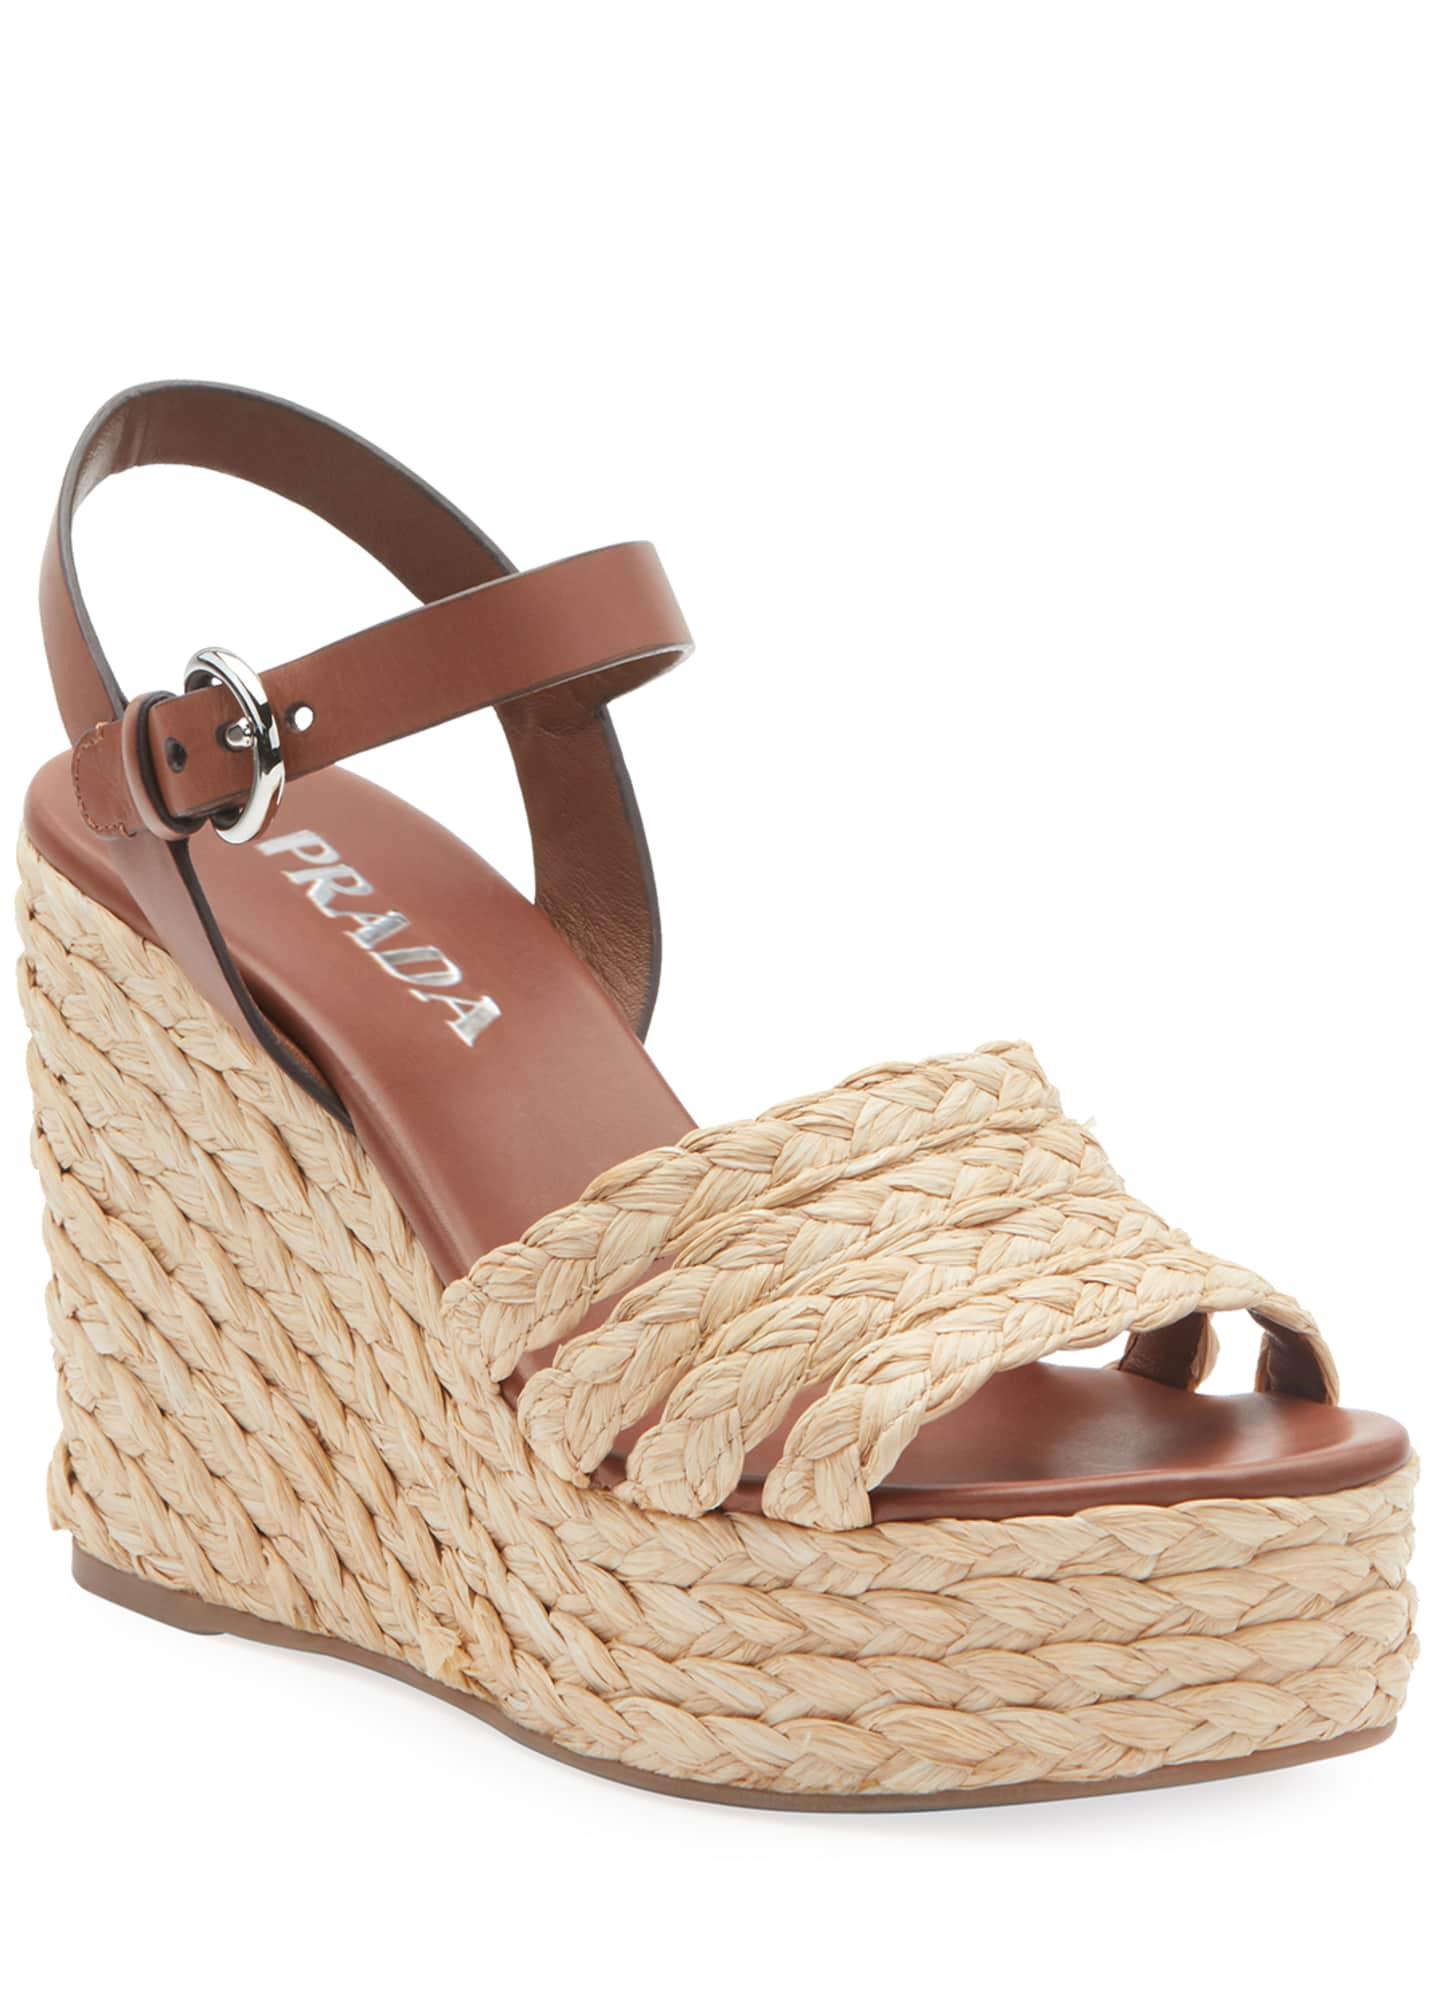 Prada Woven Raffia Platform Sandals